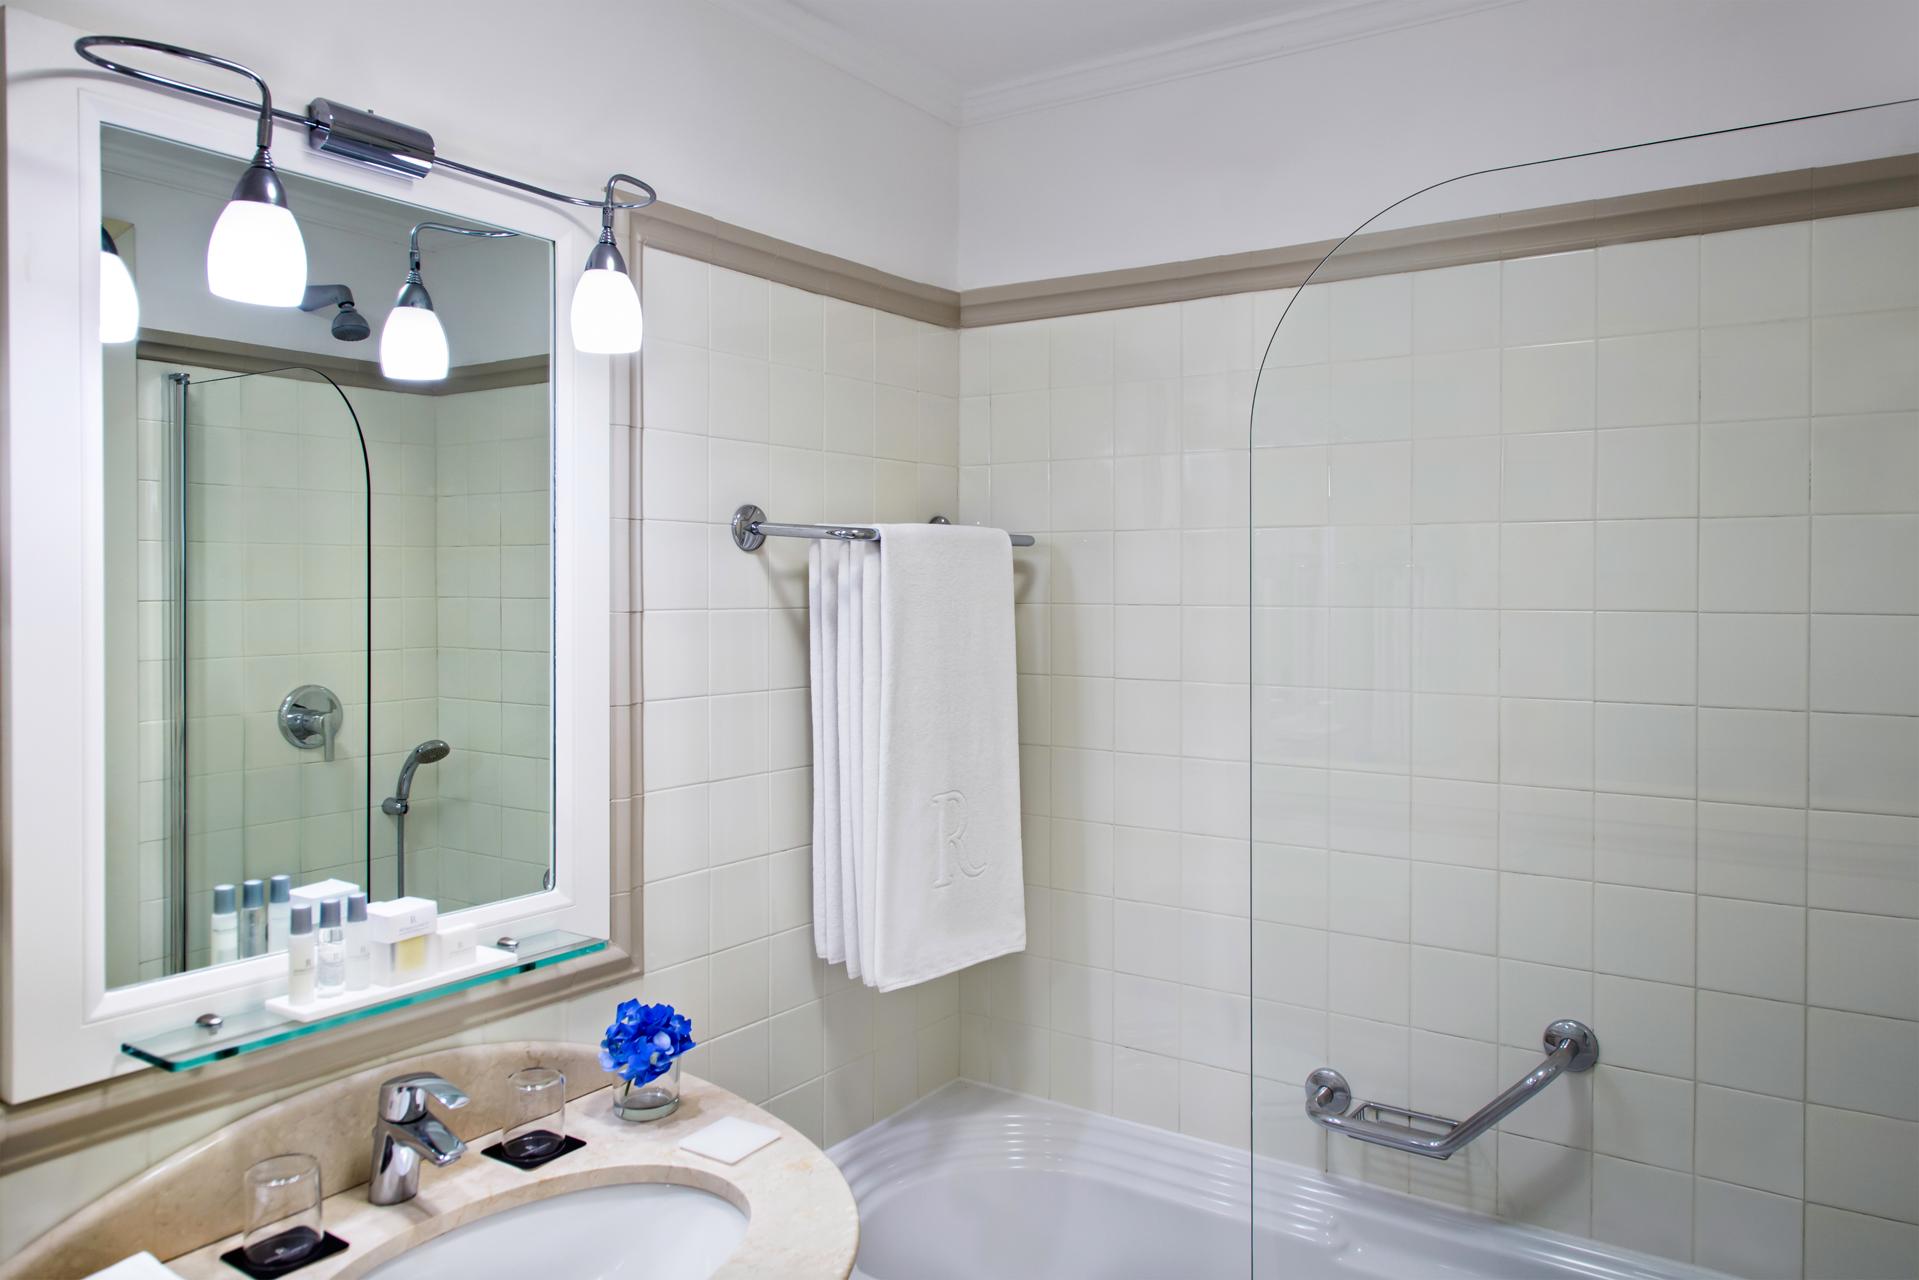 RH_NAPBR_deluxe_twin_bathroom